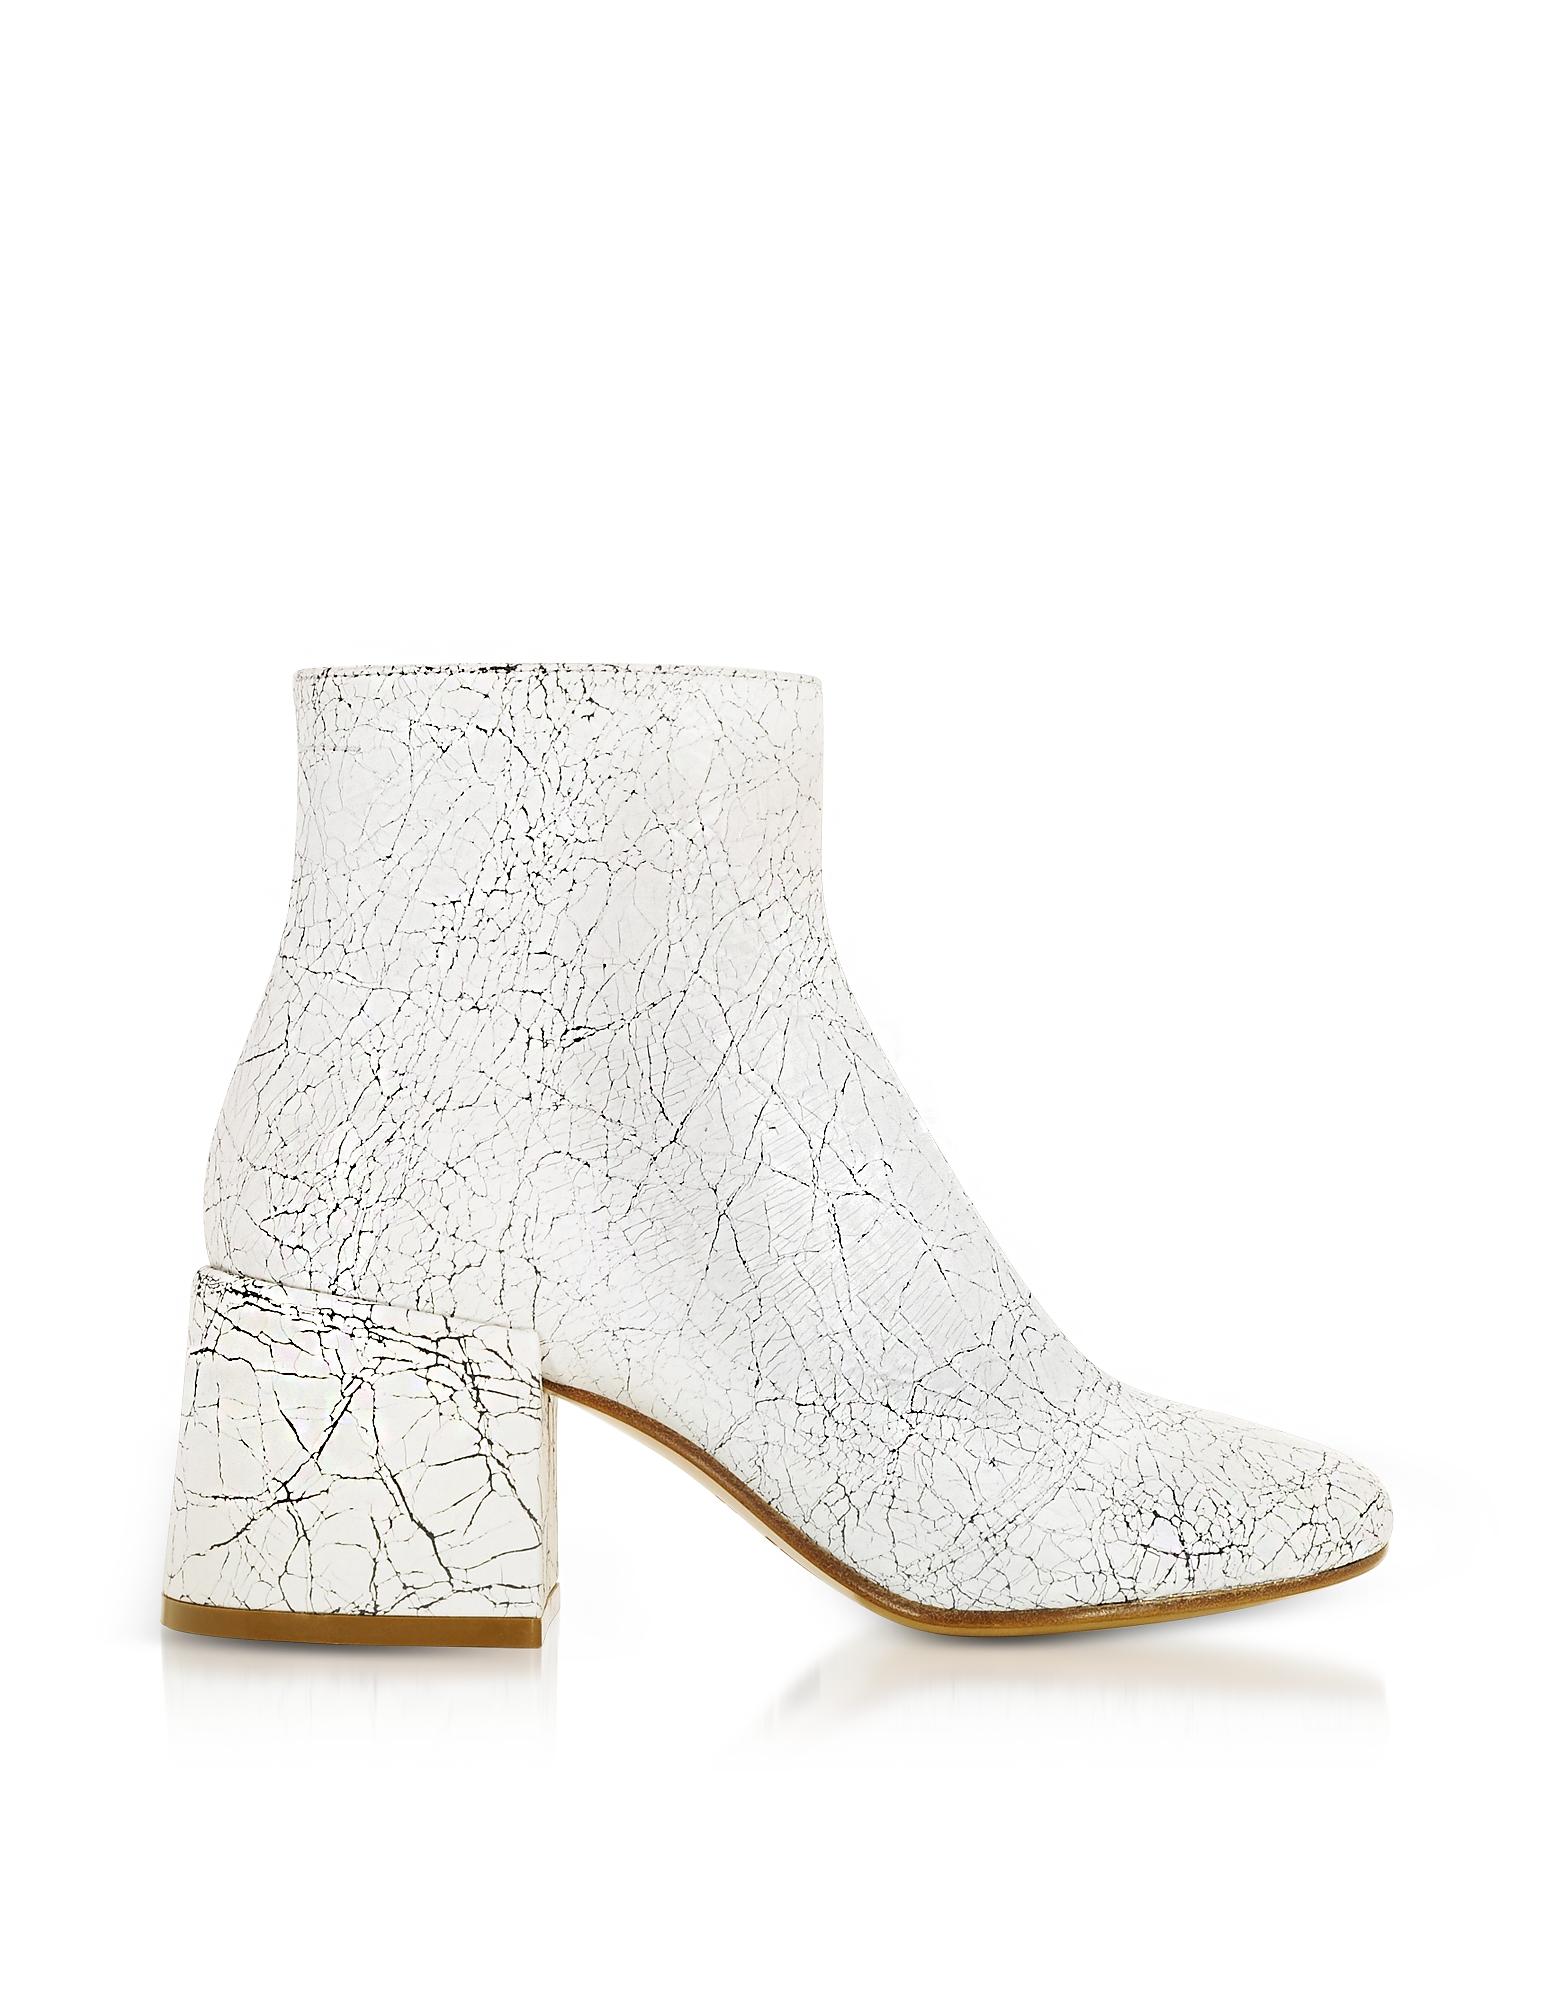 MM6 Maison Martin Margiela Shoes, White Crackled Leather Boots